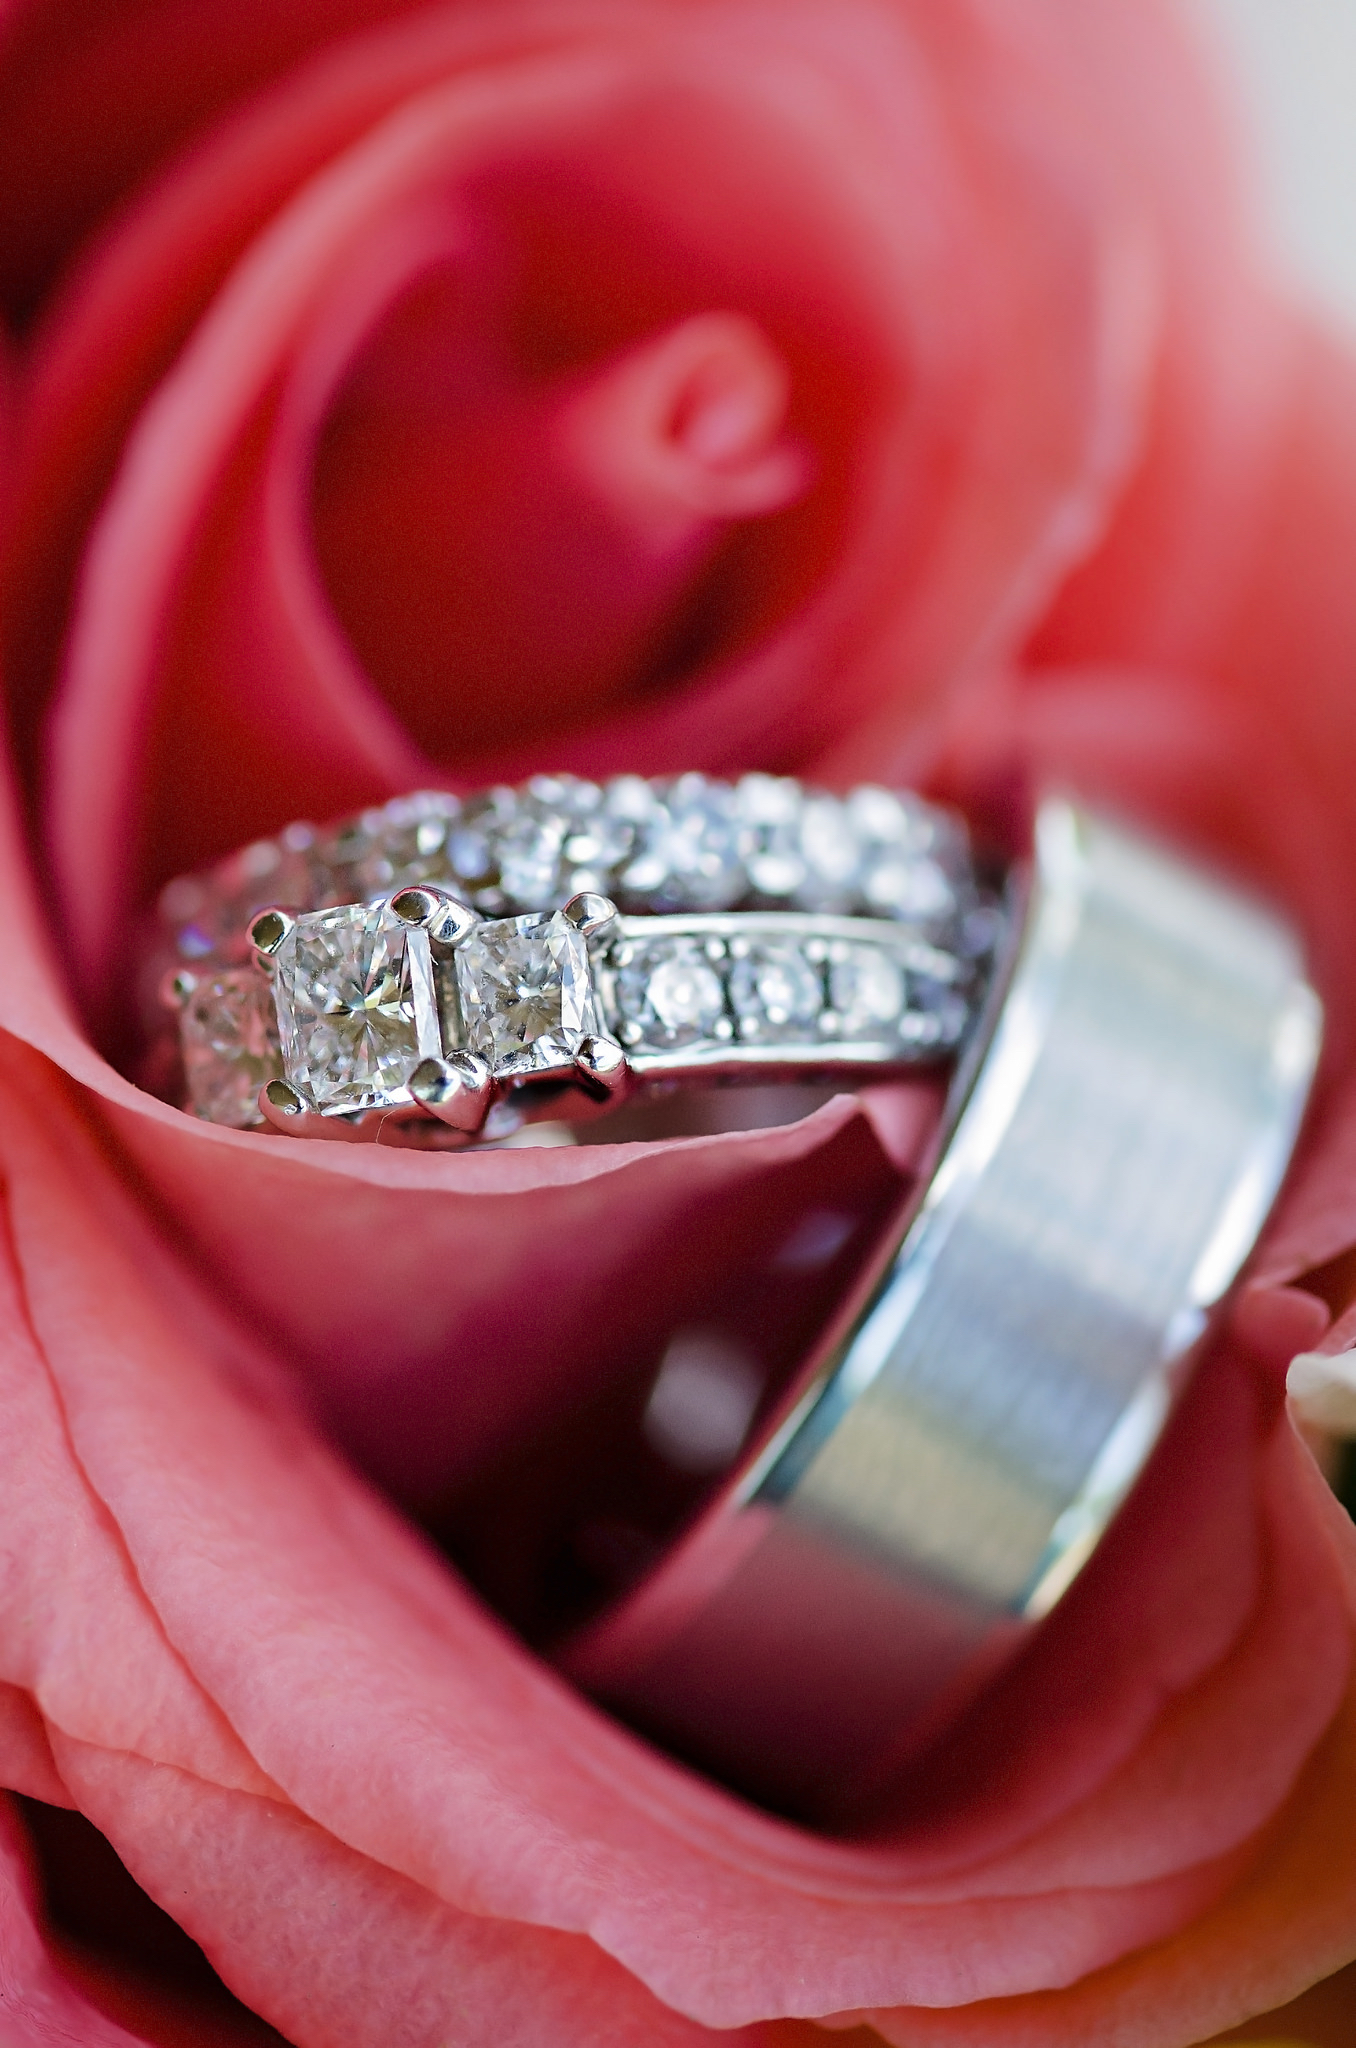 kristine_wedding_rings_spiritedtable_photo14.jpg